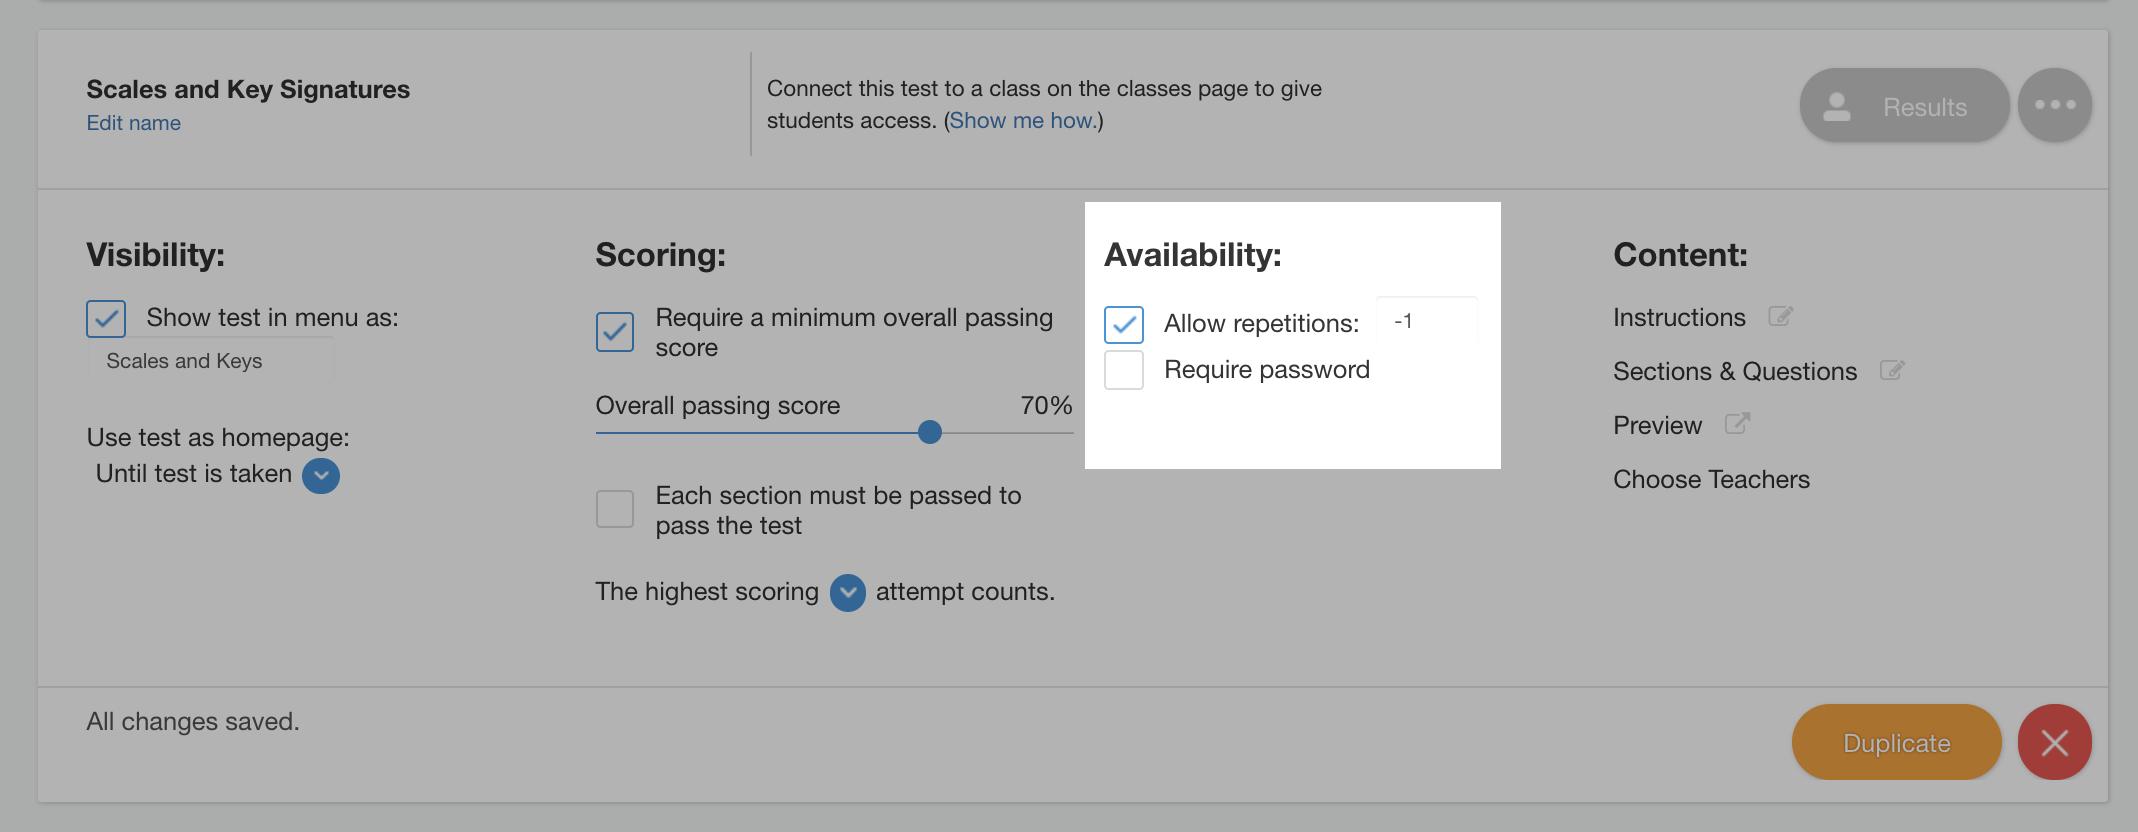 test availability options